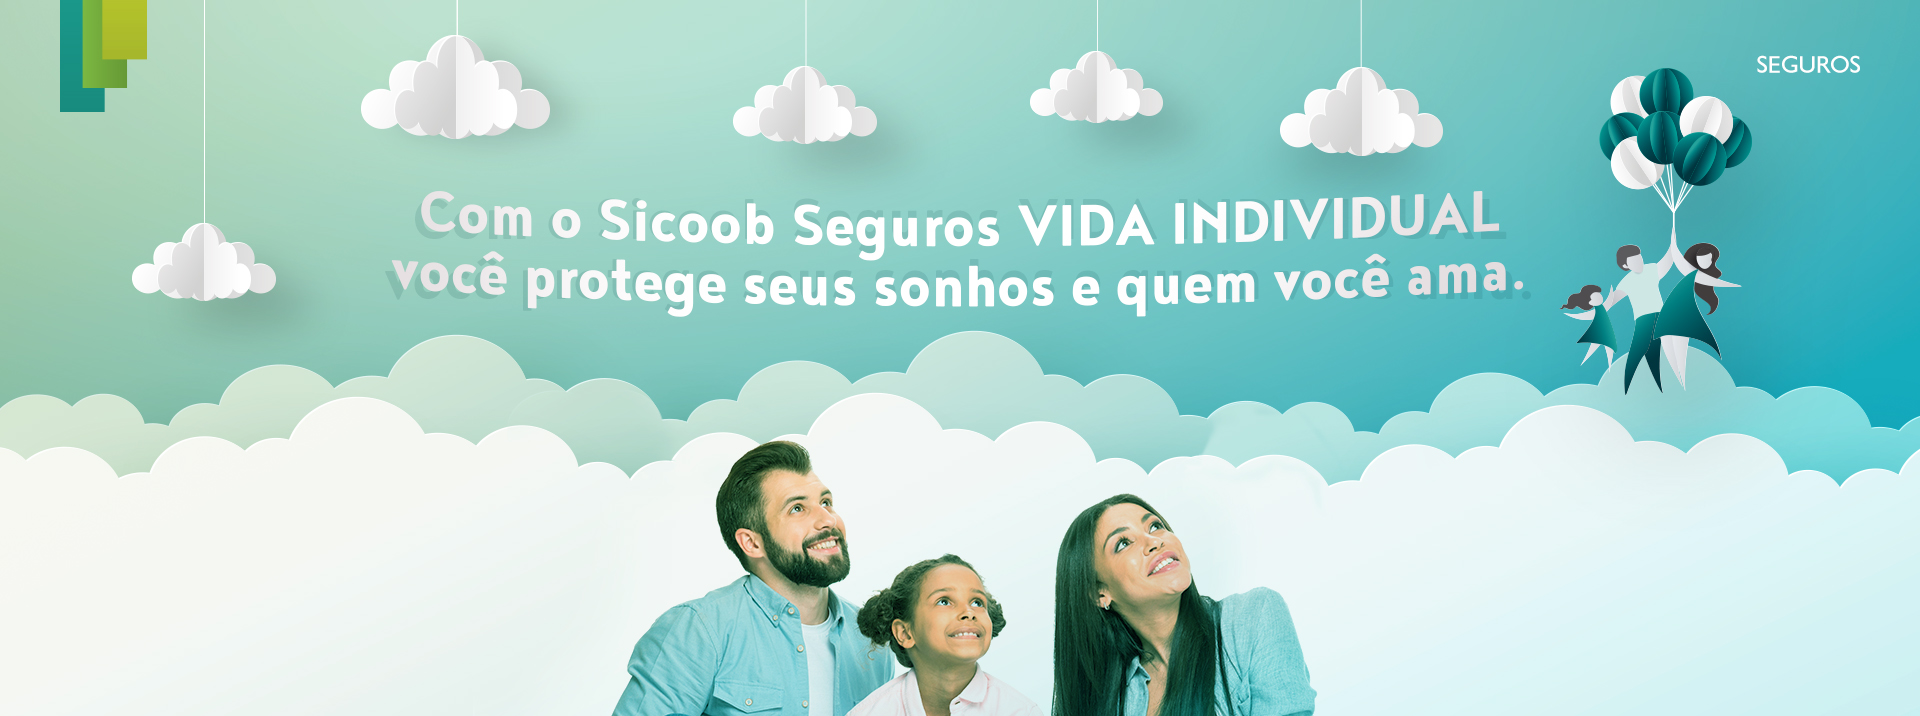 Seguro-Vida-Individual_1920x716px_SemLogo